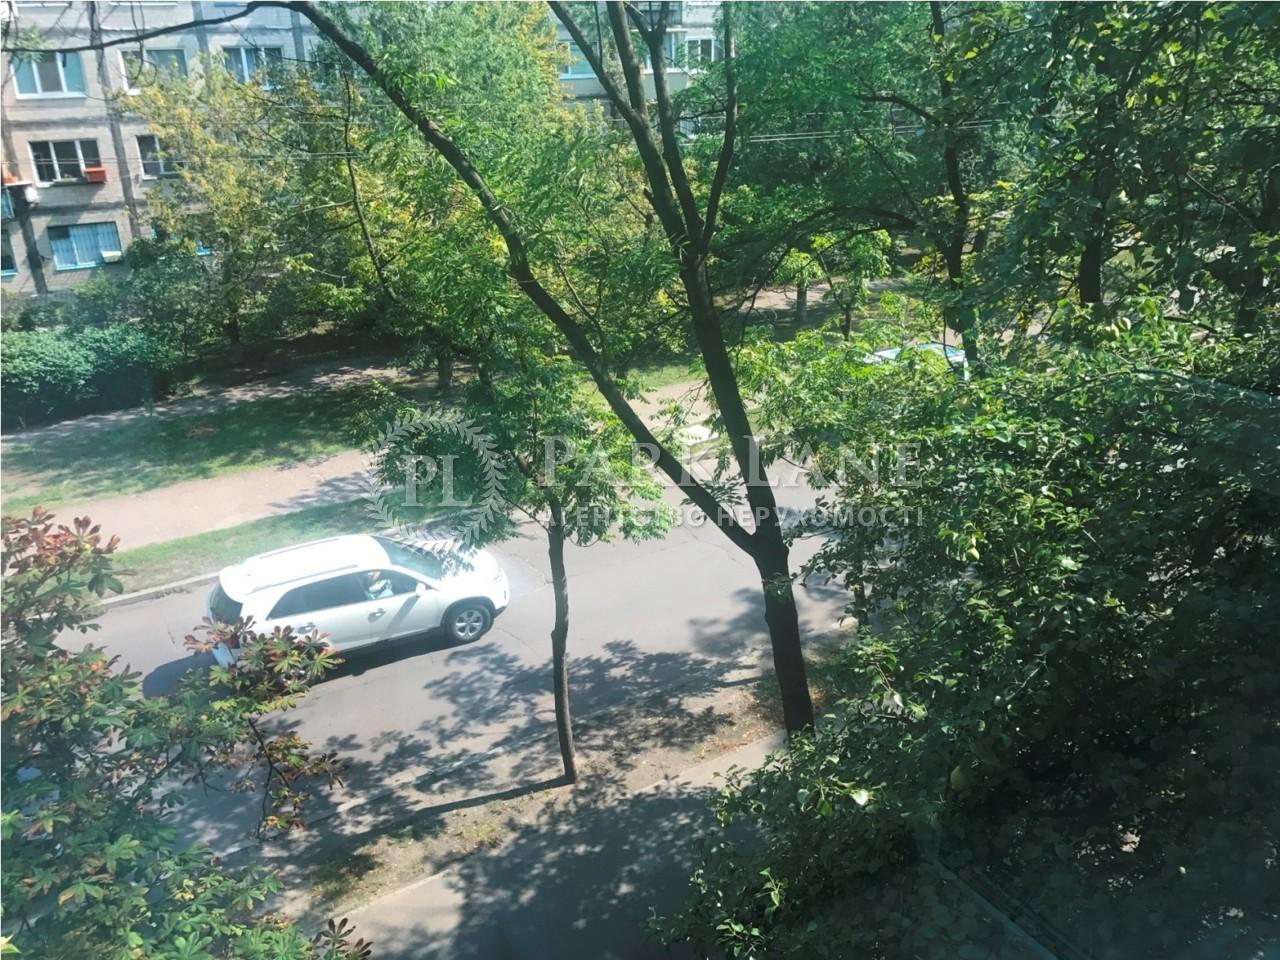 Квартира ул. Бажова, 7/21, Киев, Z-208414 - Фото 24